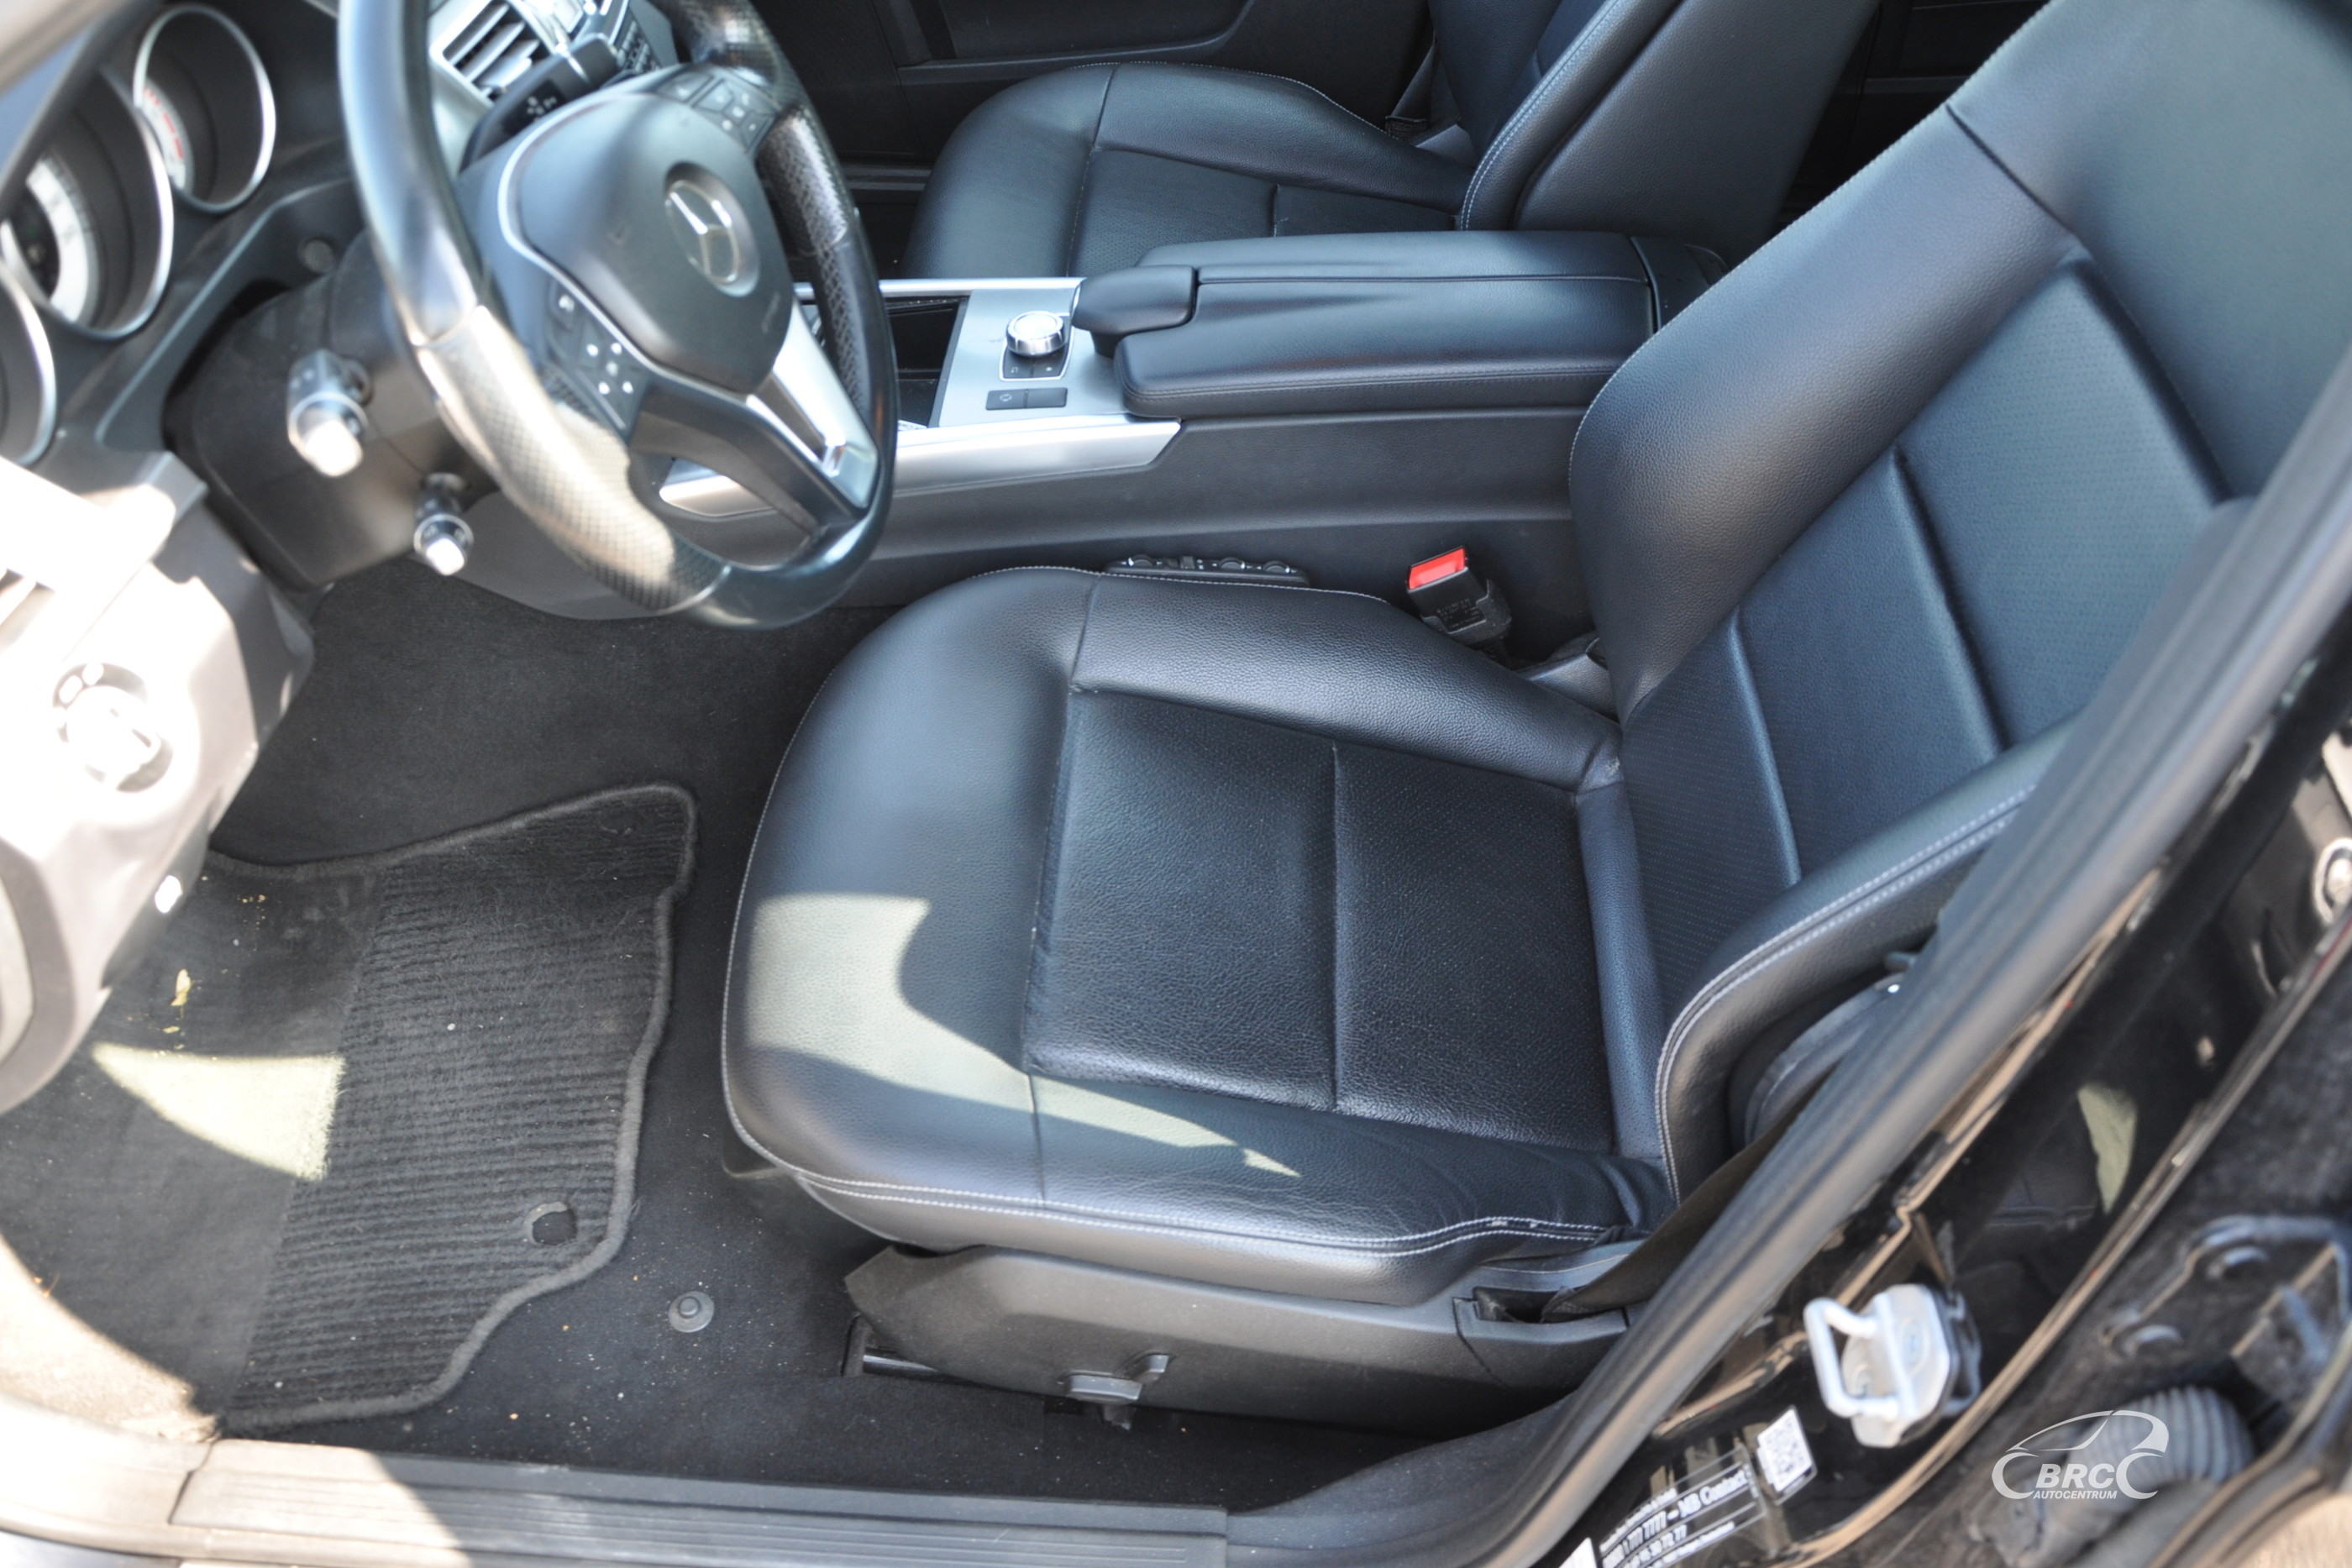 Mercedes-Benz E 250 CDI 4Matic Avantgarde Combi Automatas